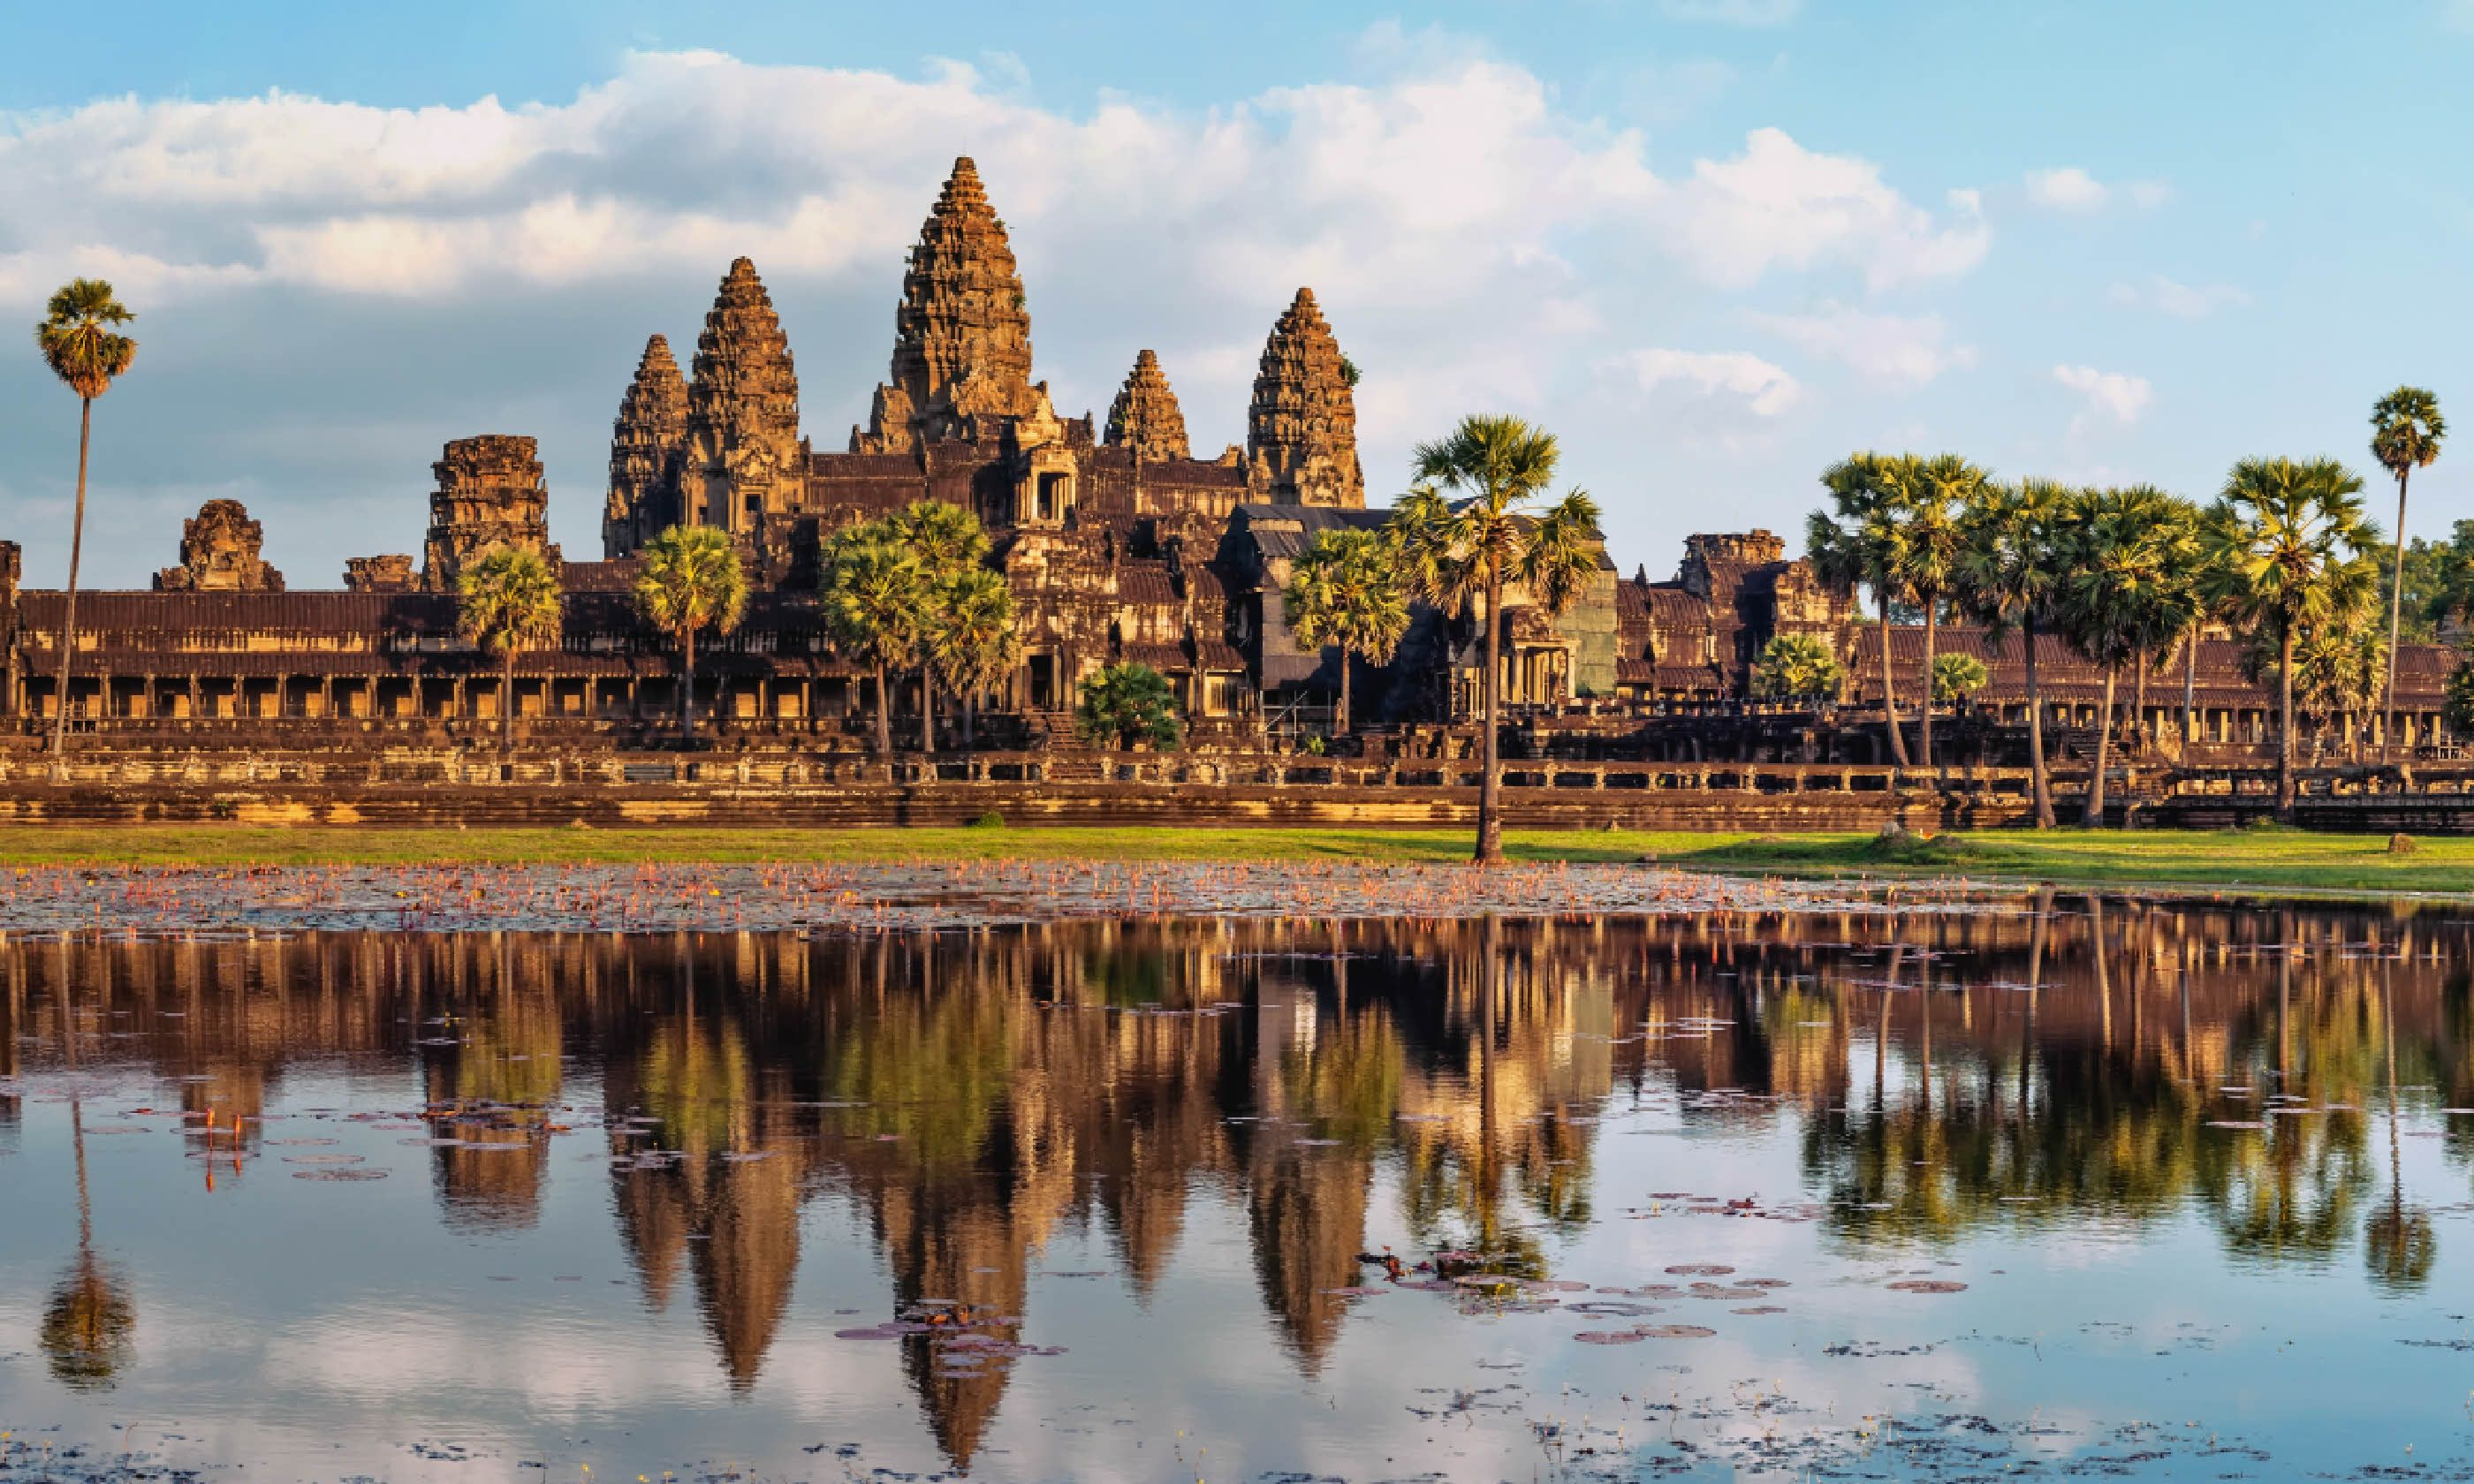 Angkor Wat temple at sunset (Shutterstock)